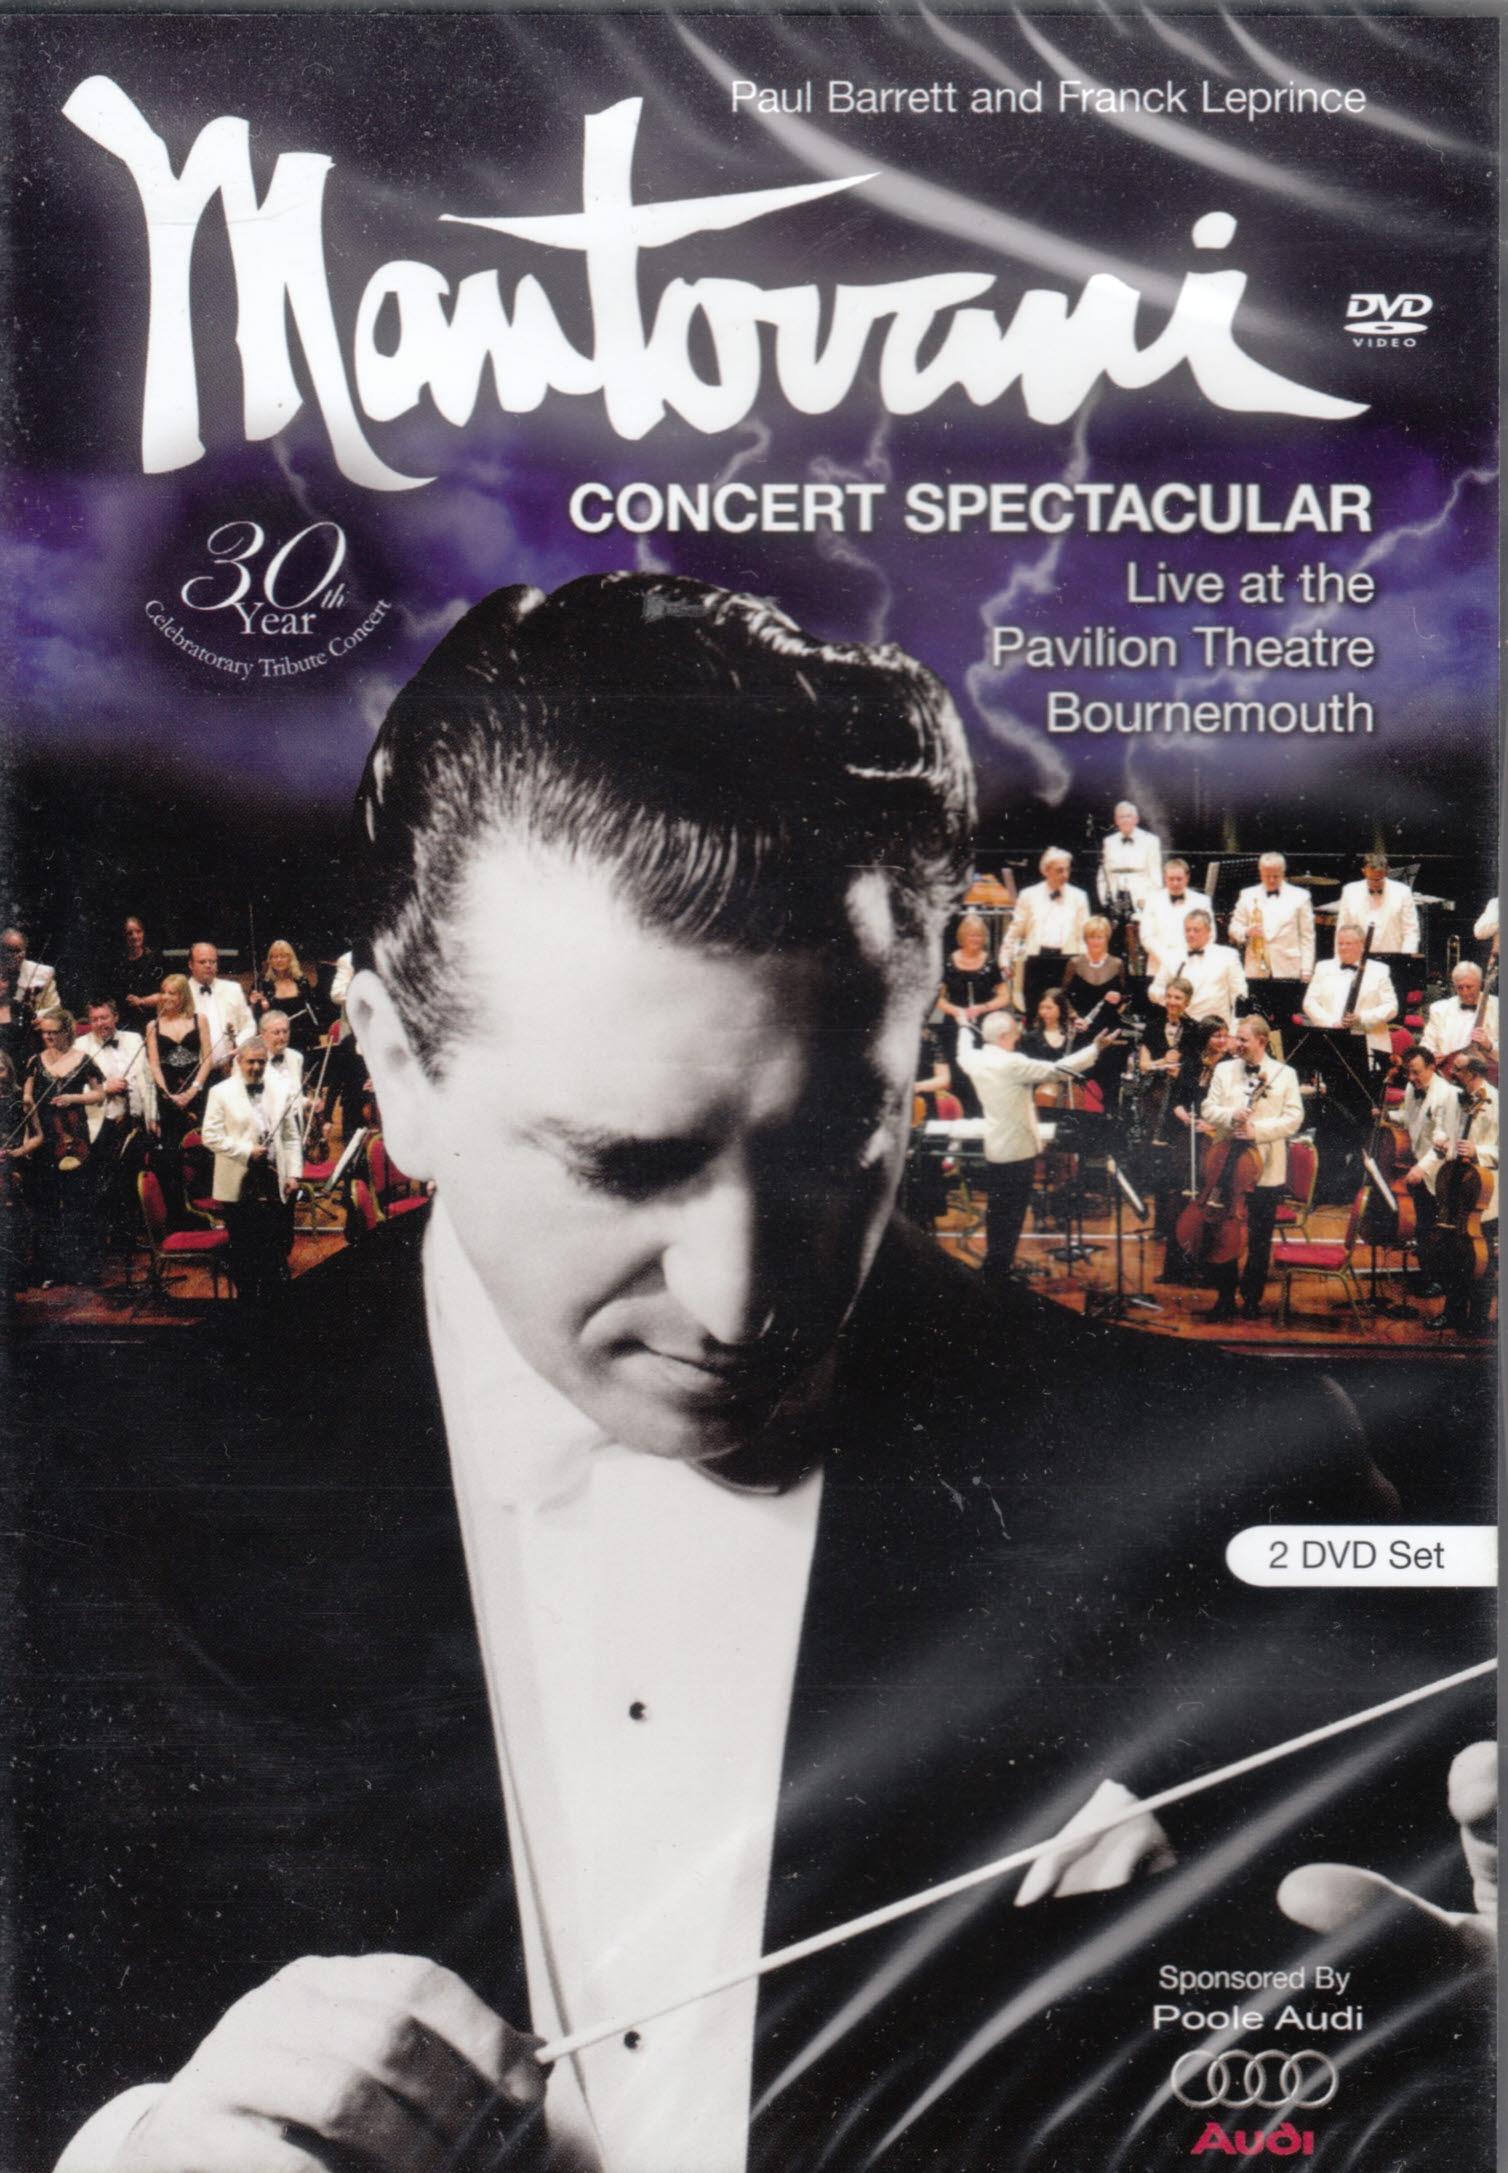 Concert Spectacular DVD